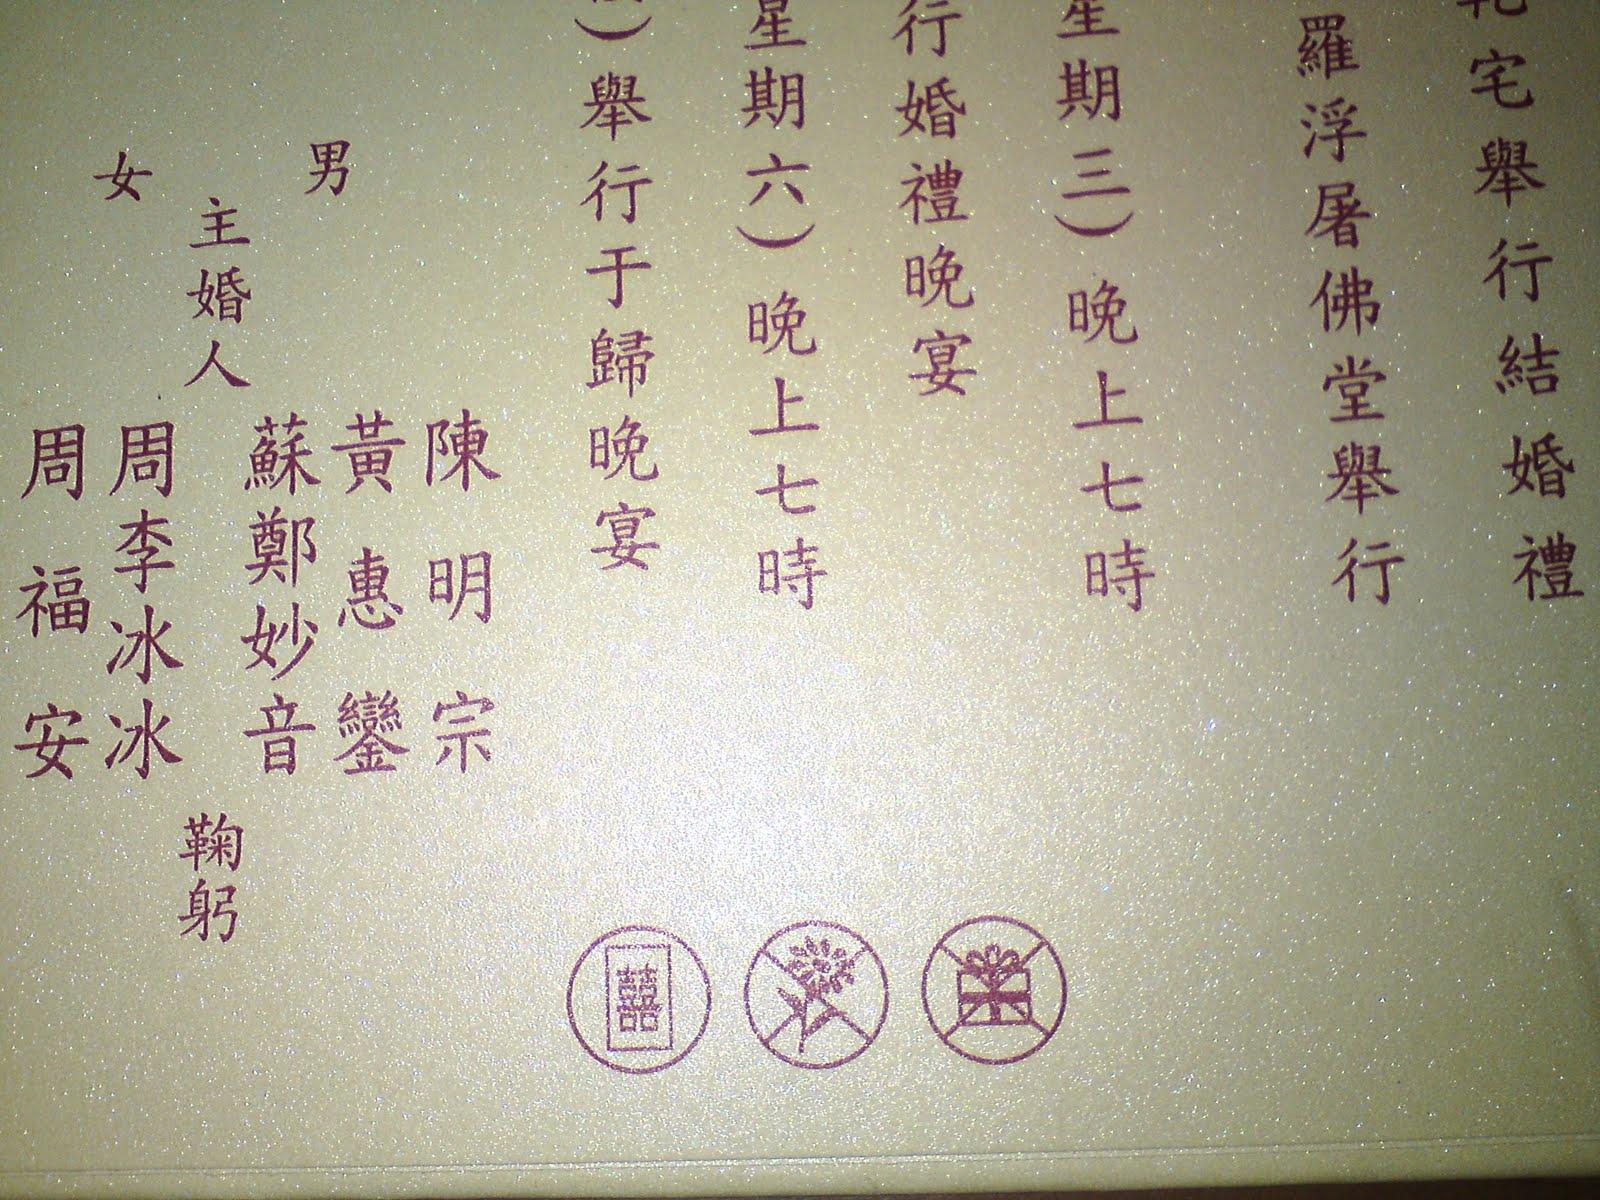 Li tings alon3 wedding reception invitation card monday january 17 2011 stopboris Image collections